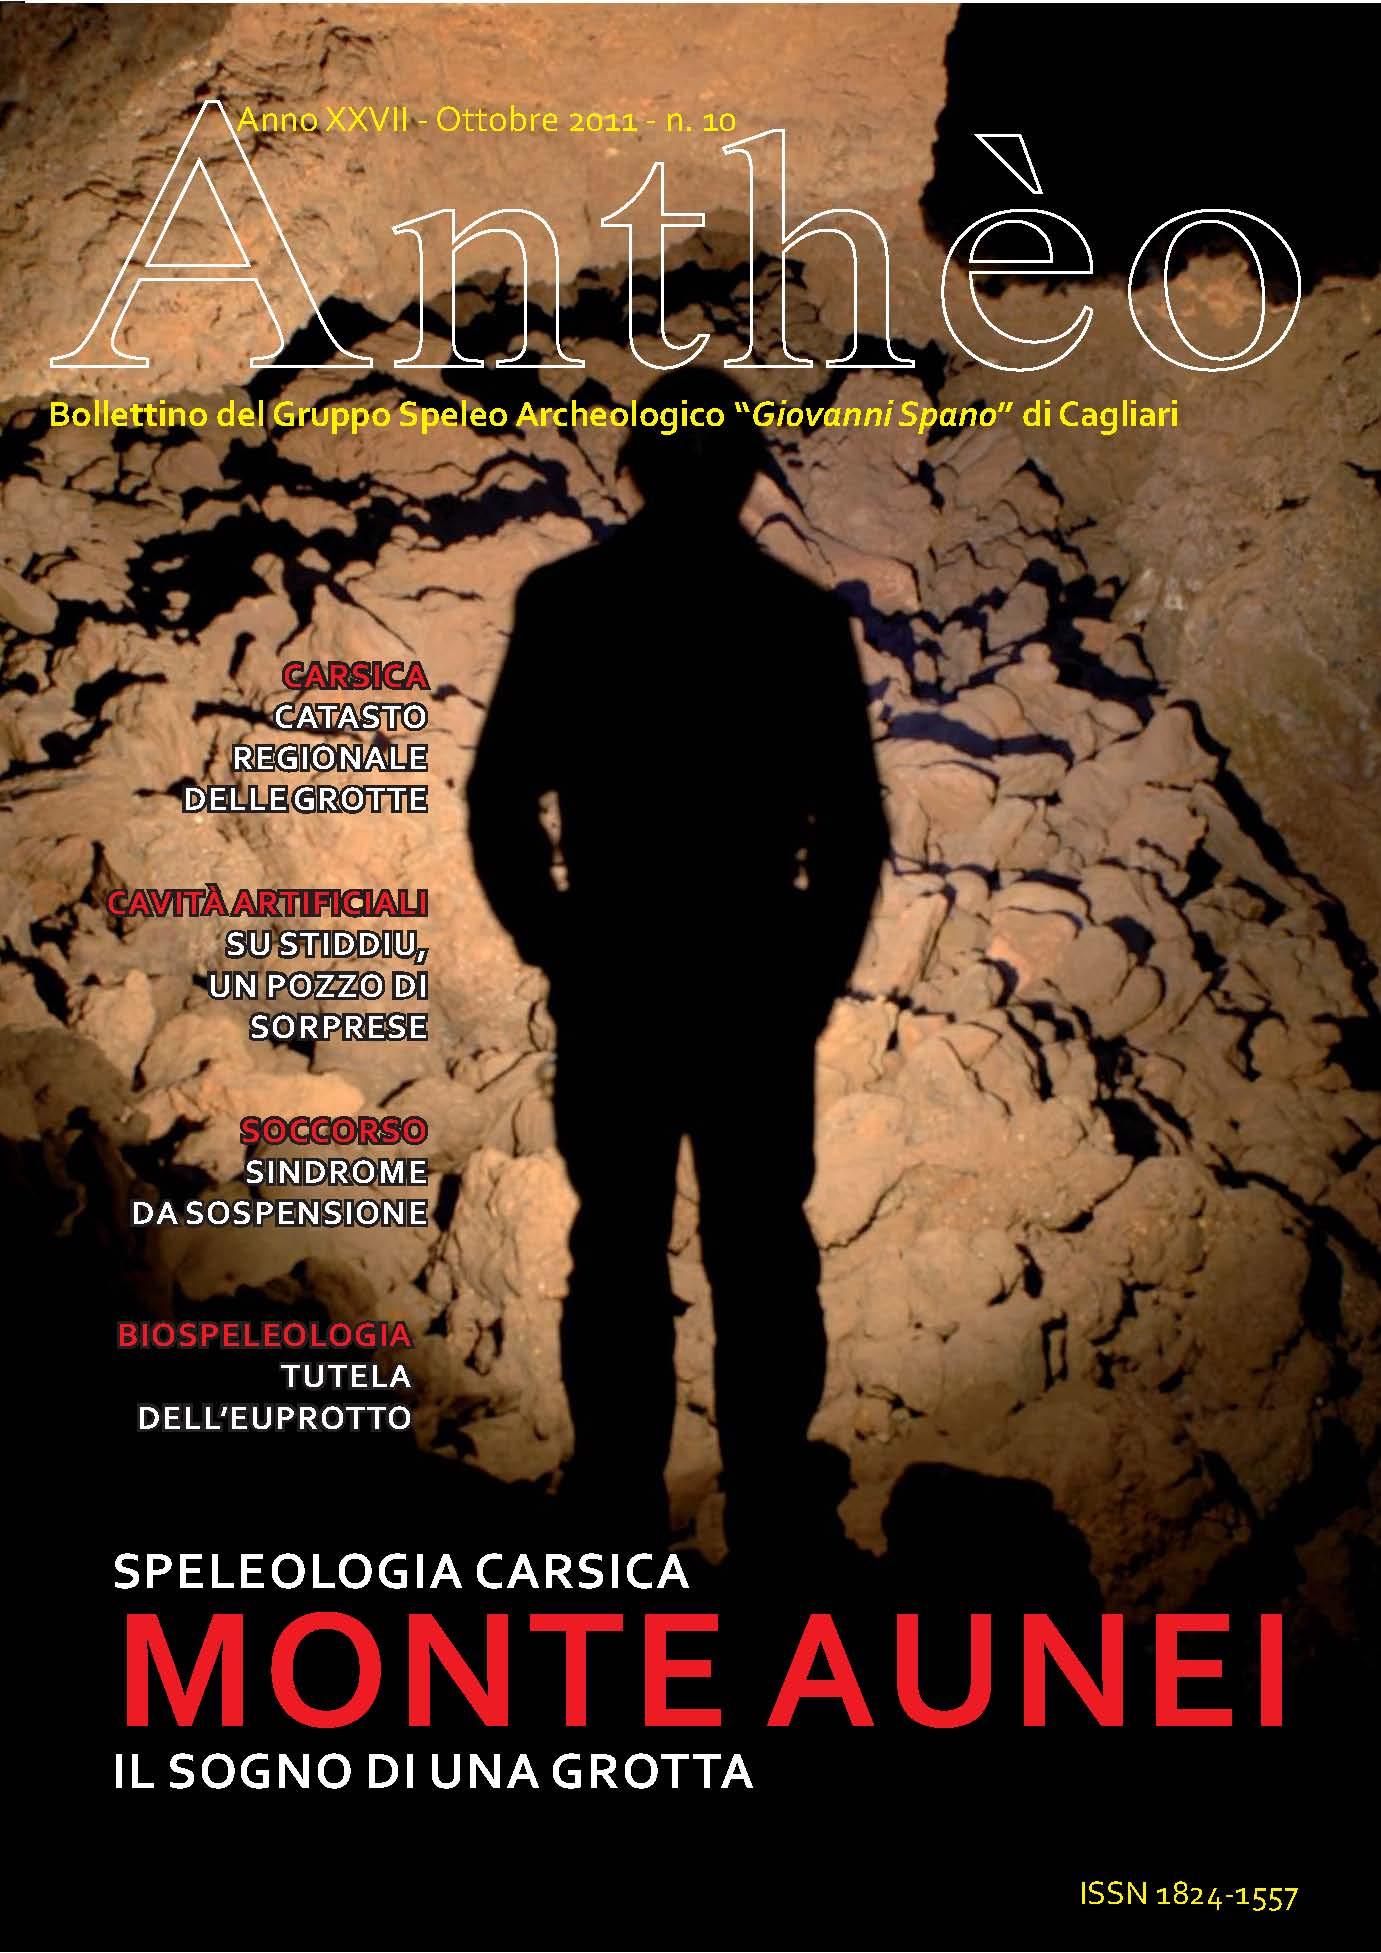 Nuovo Anthèo – n. 10 ottobre 2011